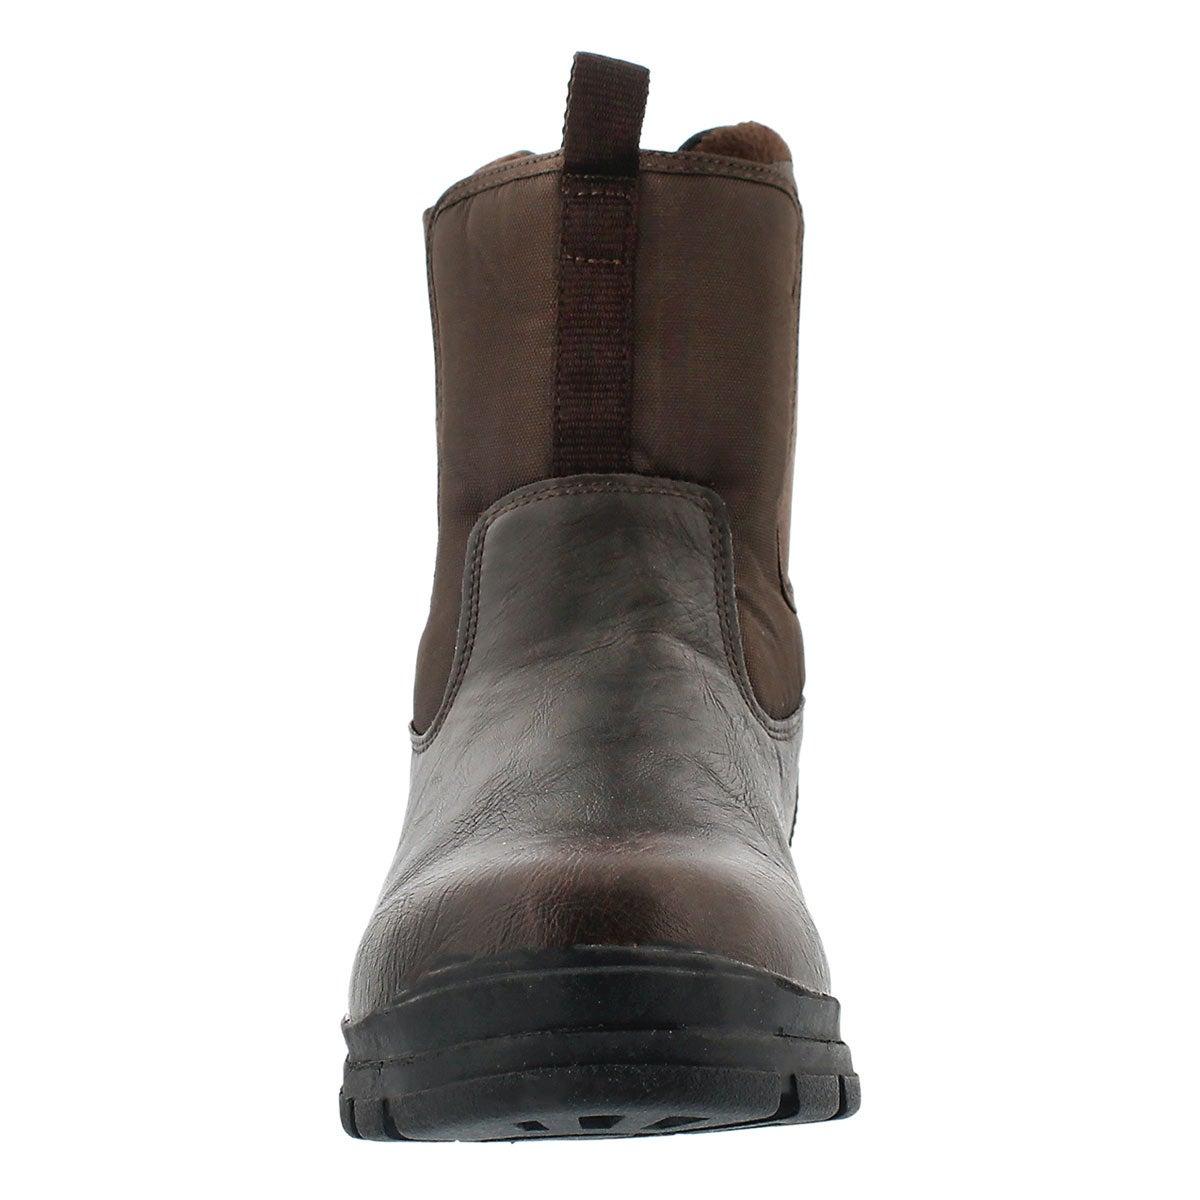 Mns Zago dk brn wtrpf winter boot